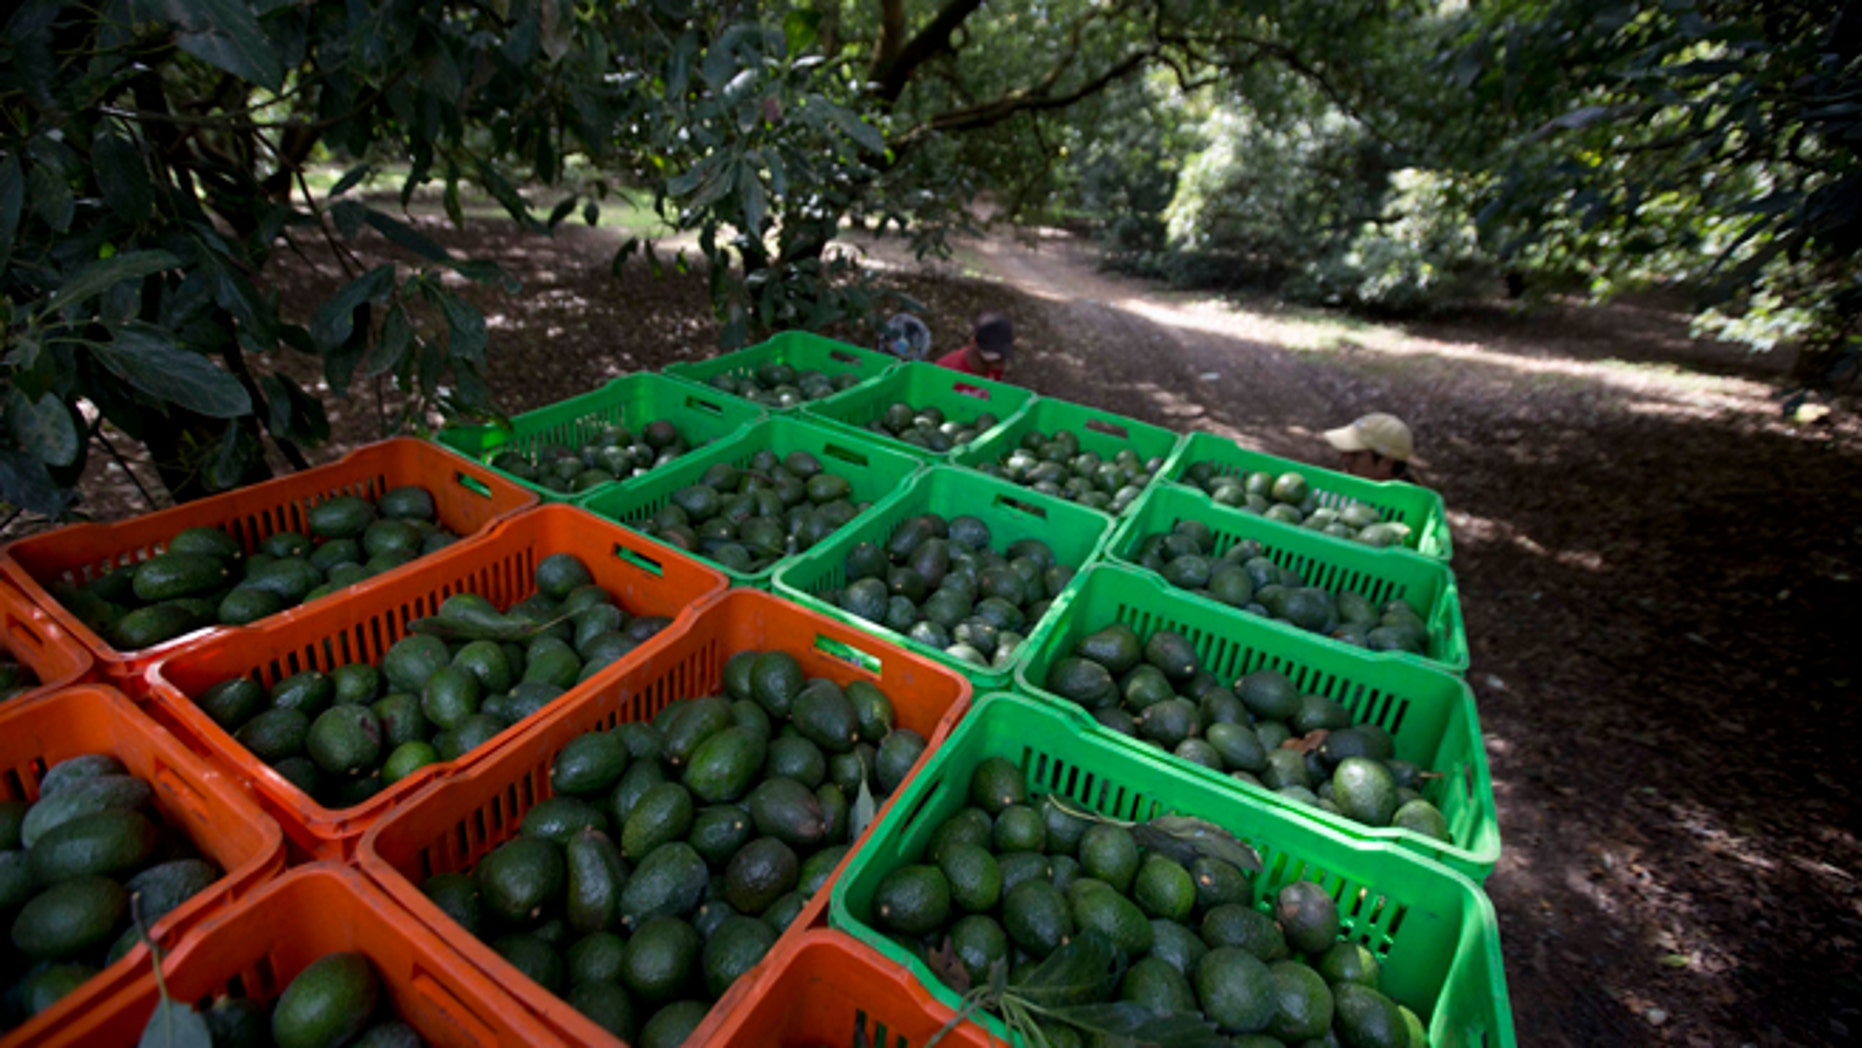 Avocado boxes are collected in an avocado orchard in Michoacan, Mexico.